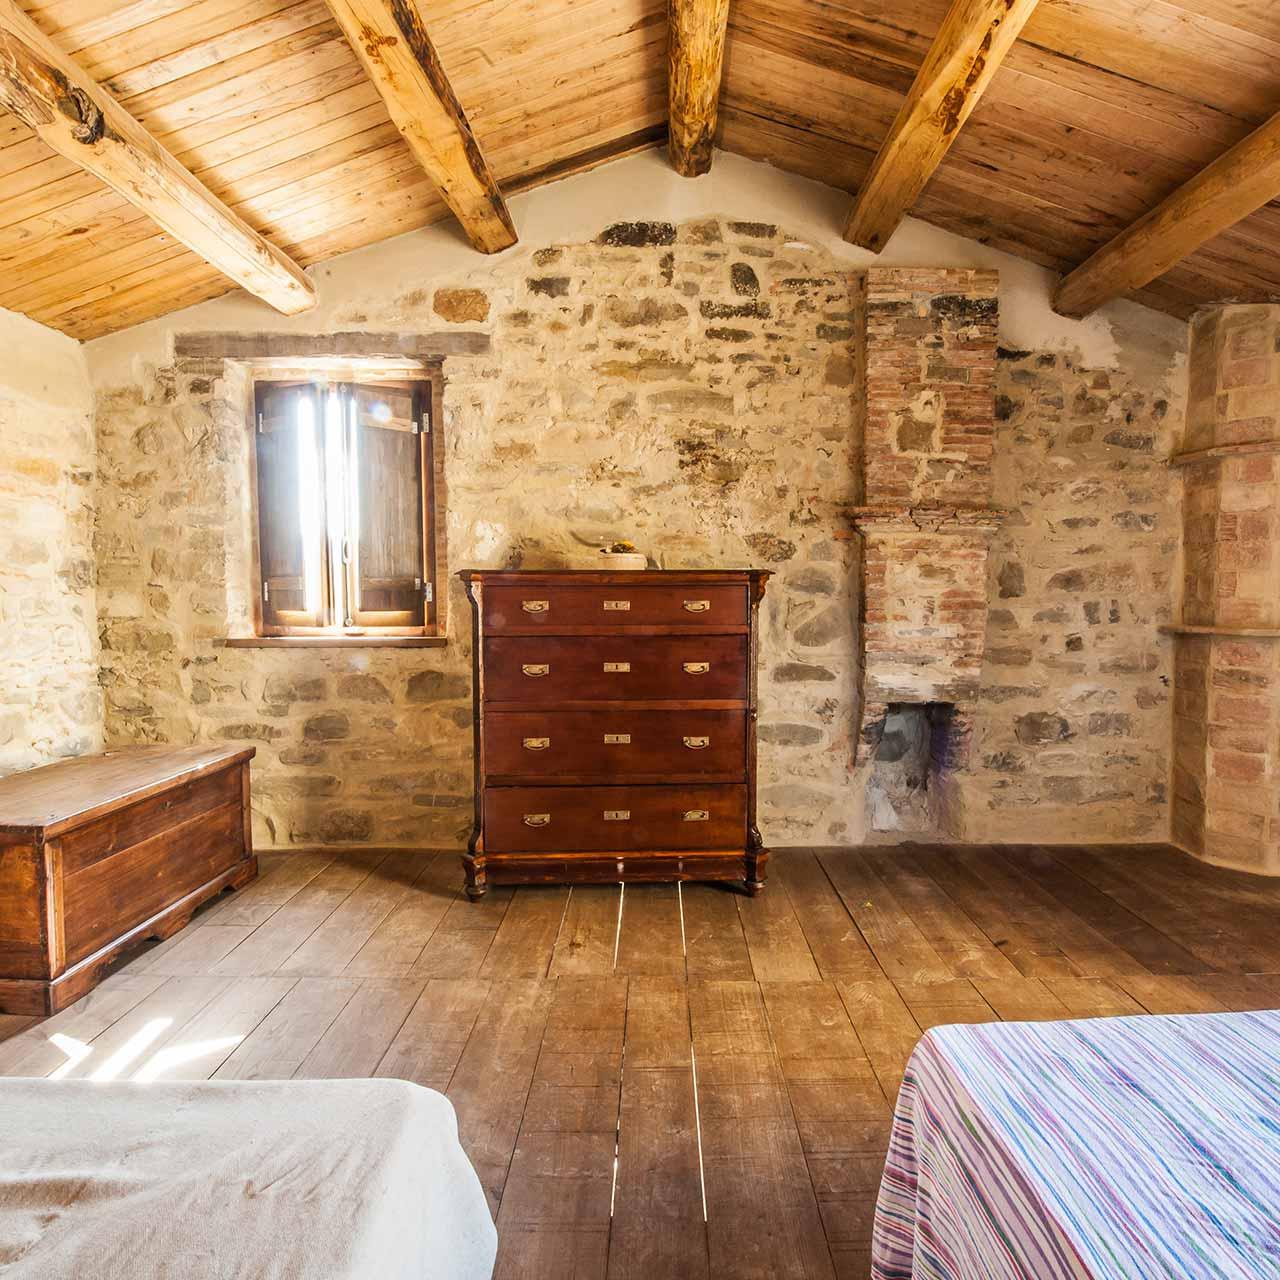 Simple Furniture art ideas for rustic bedroom design